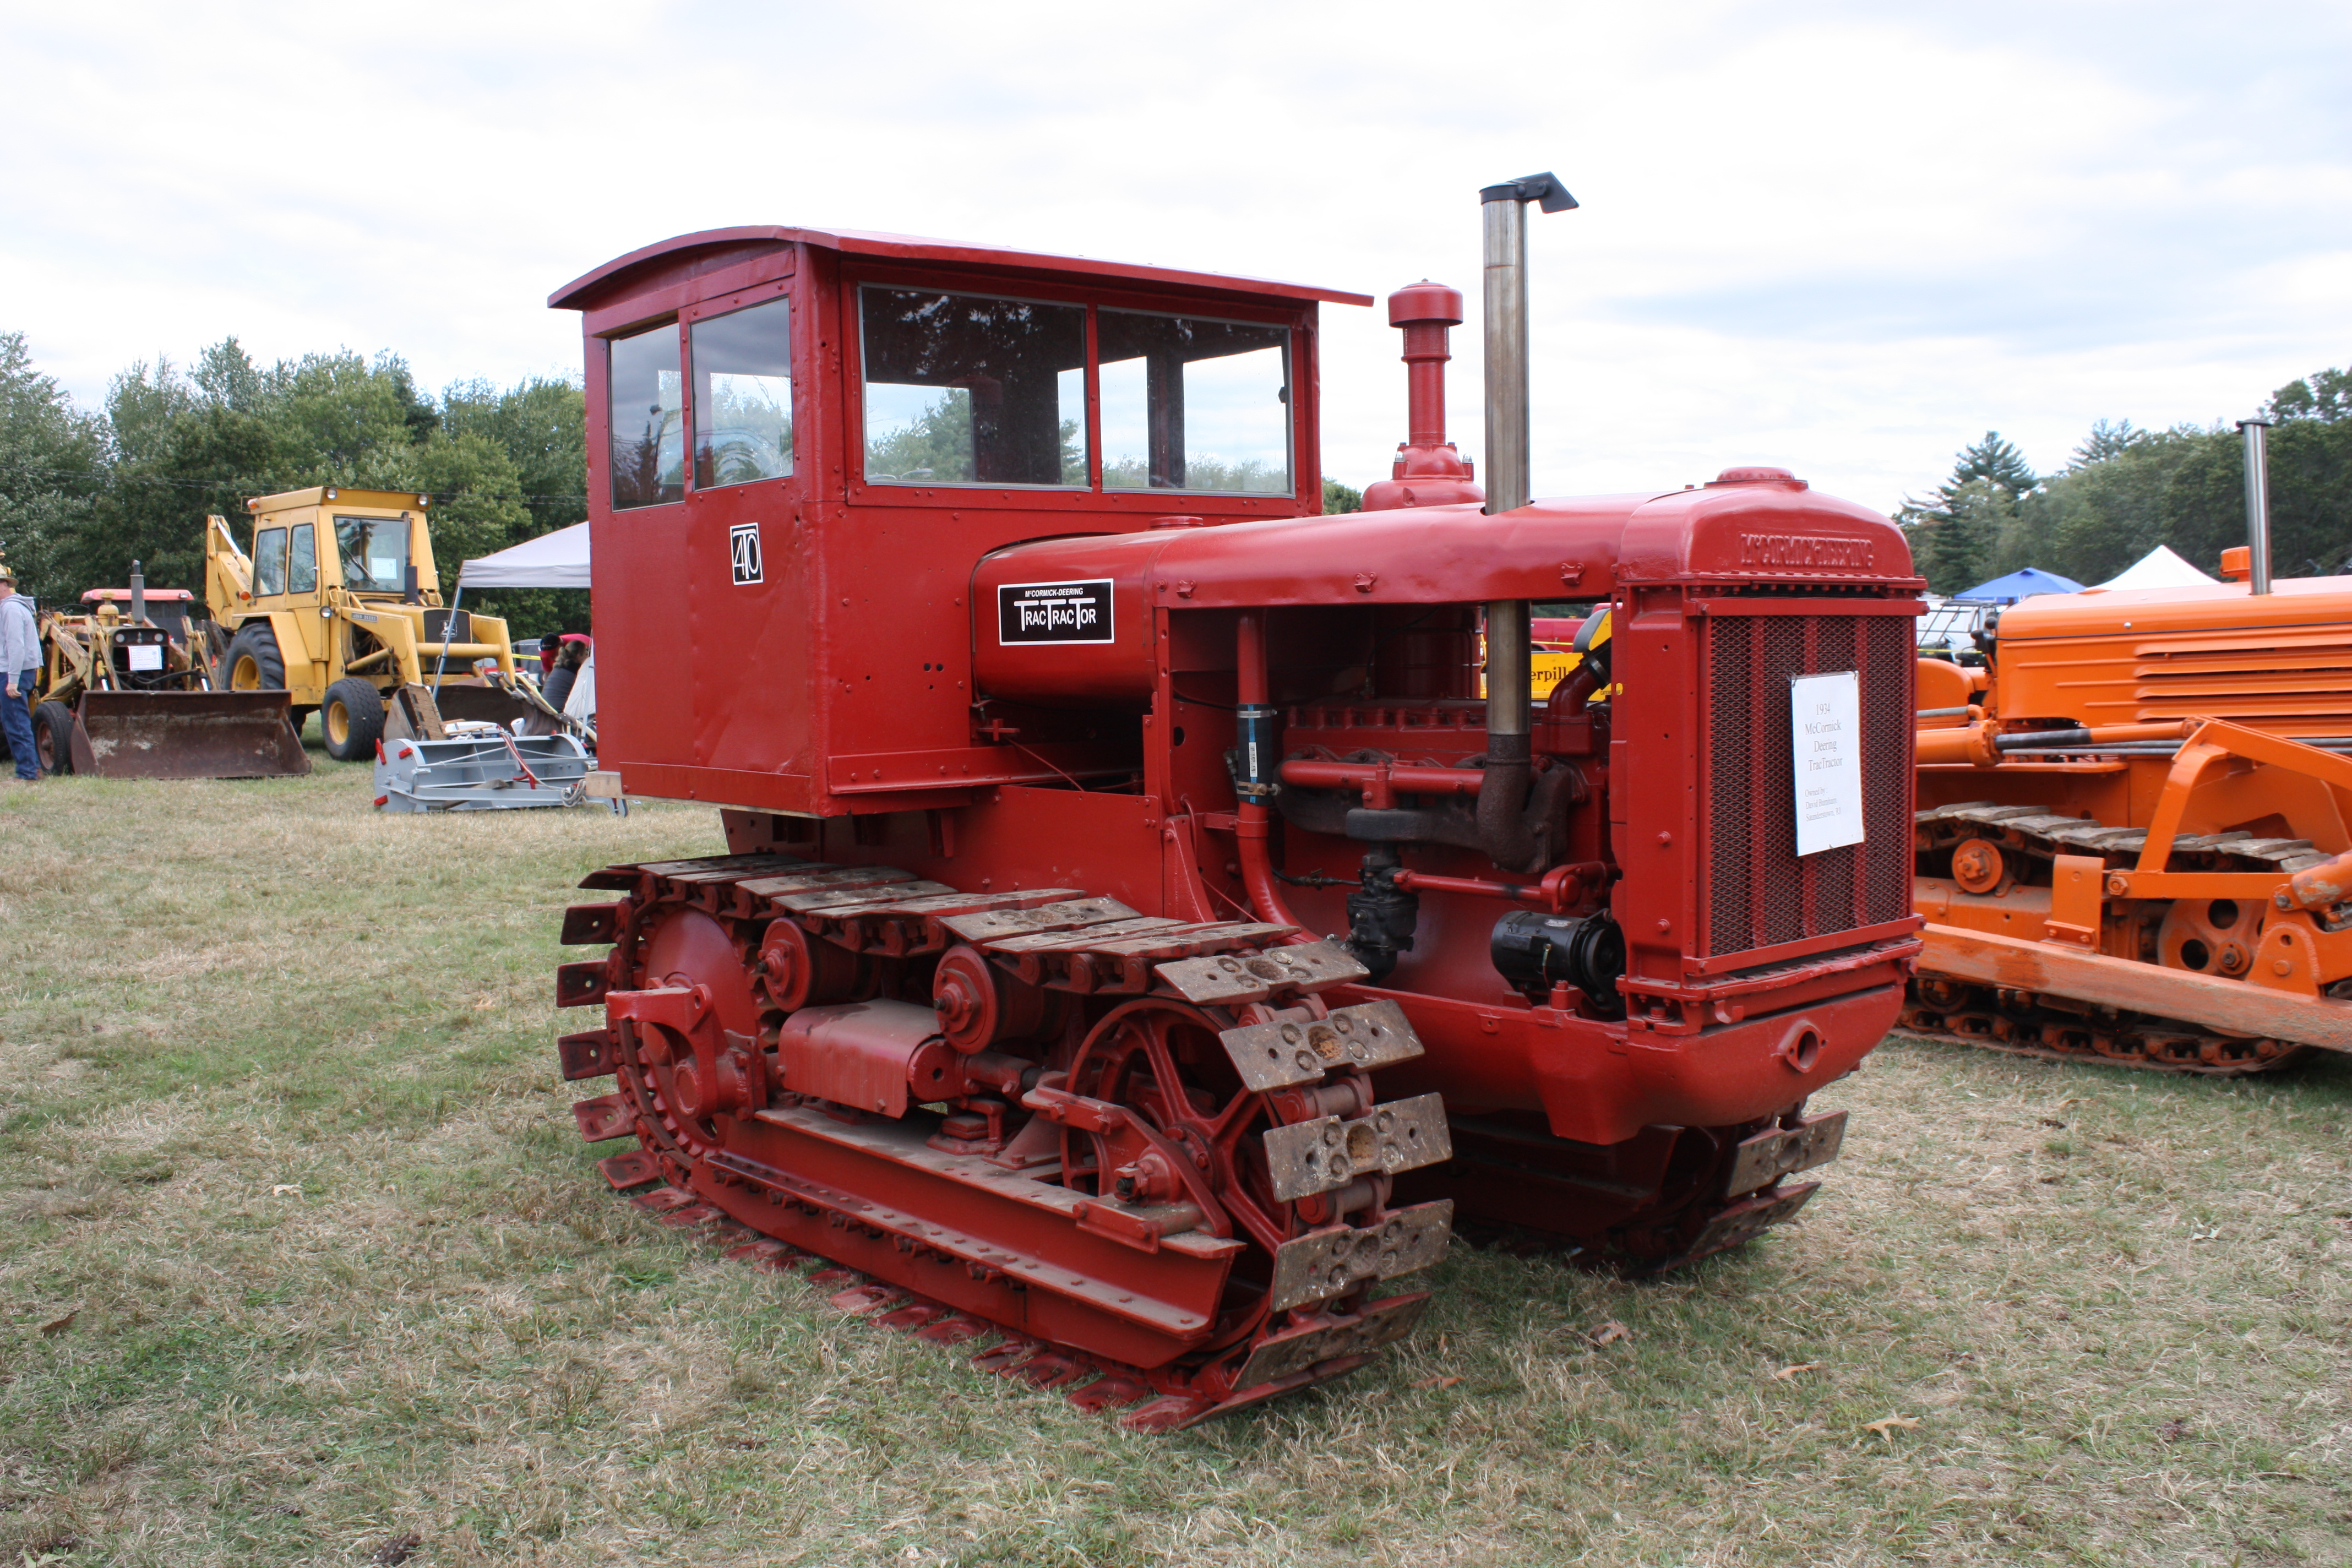 Old International Harvester : International harvester also see wheel dozers « classic